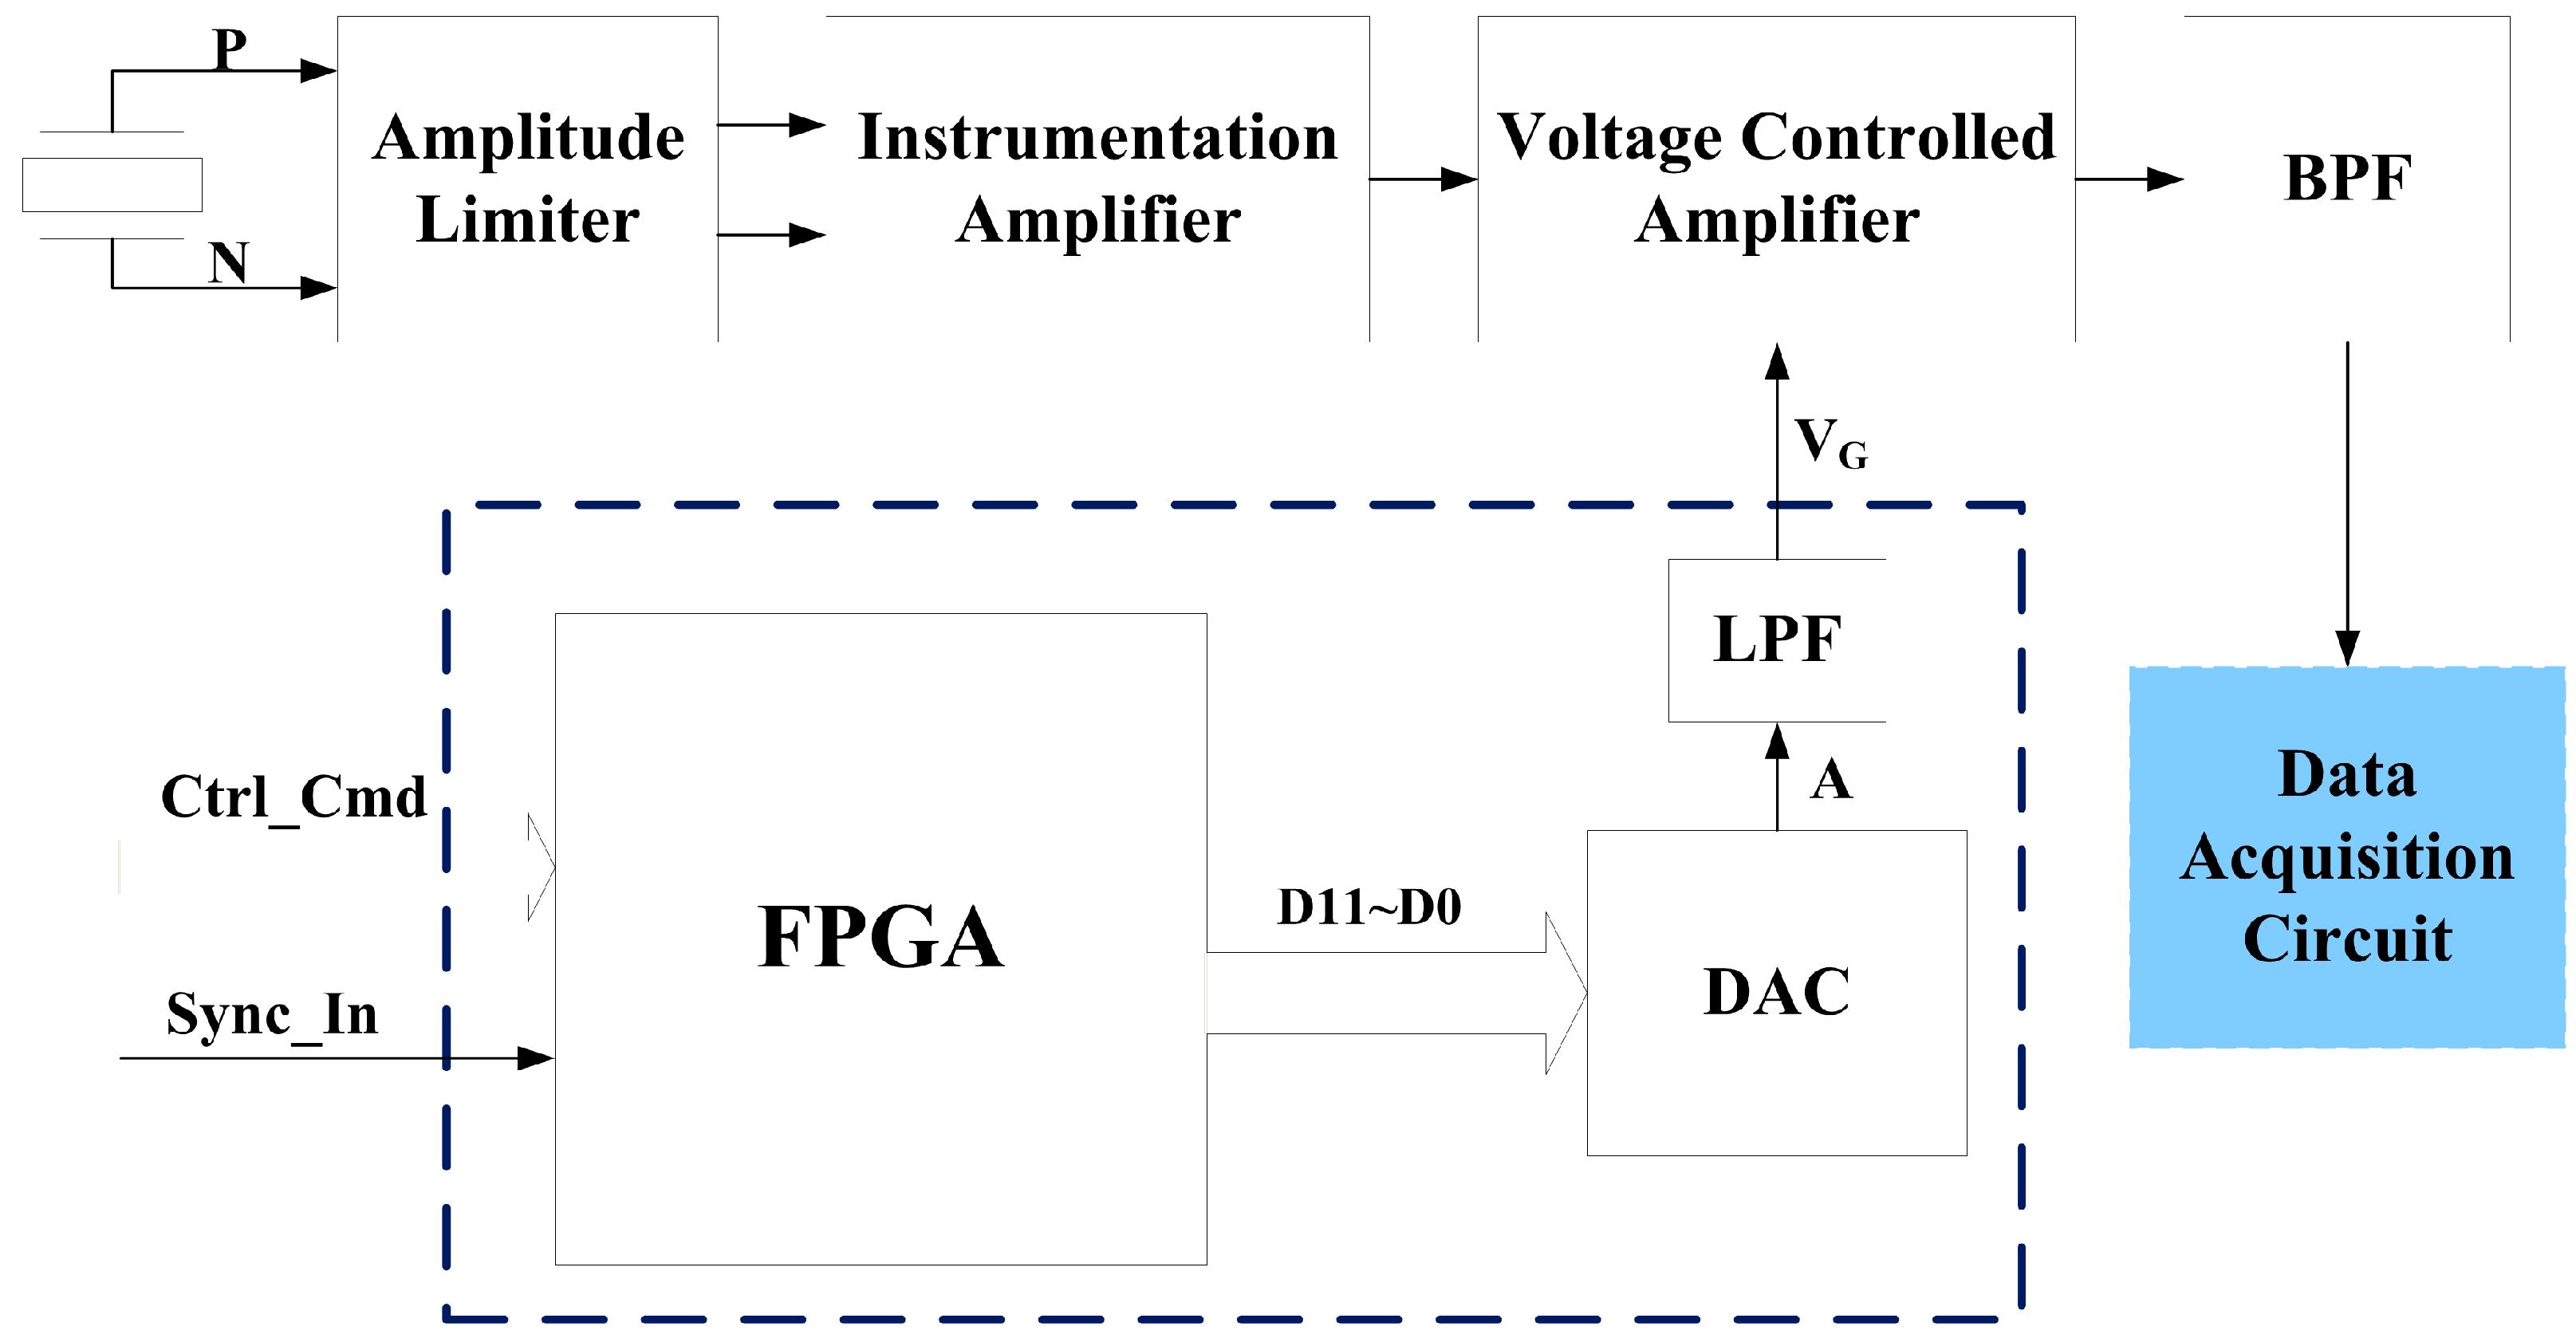 Digital Lock Circuit Diagram Tradeoficcom Browse Data Fm Modulator Power Op Amp With Current Limiting